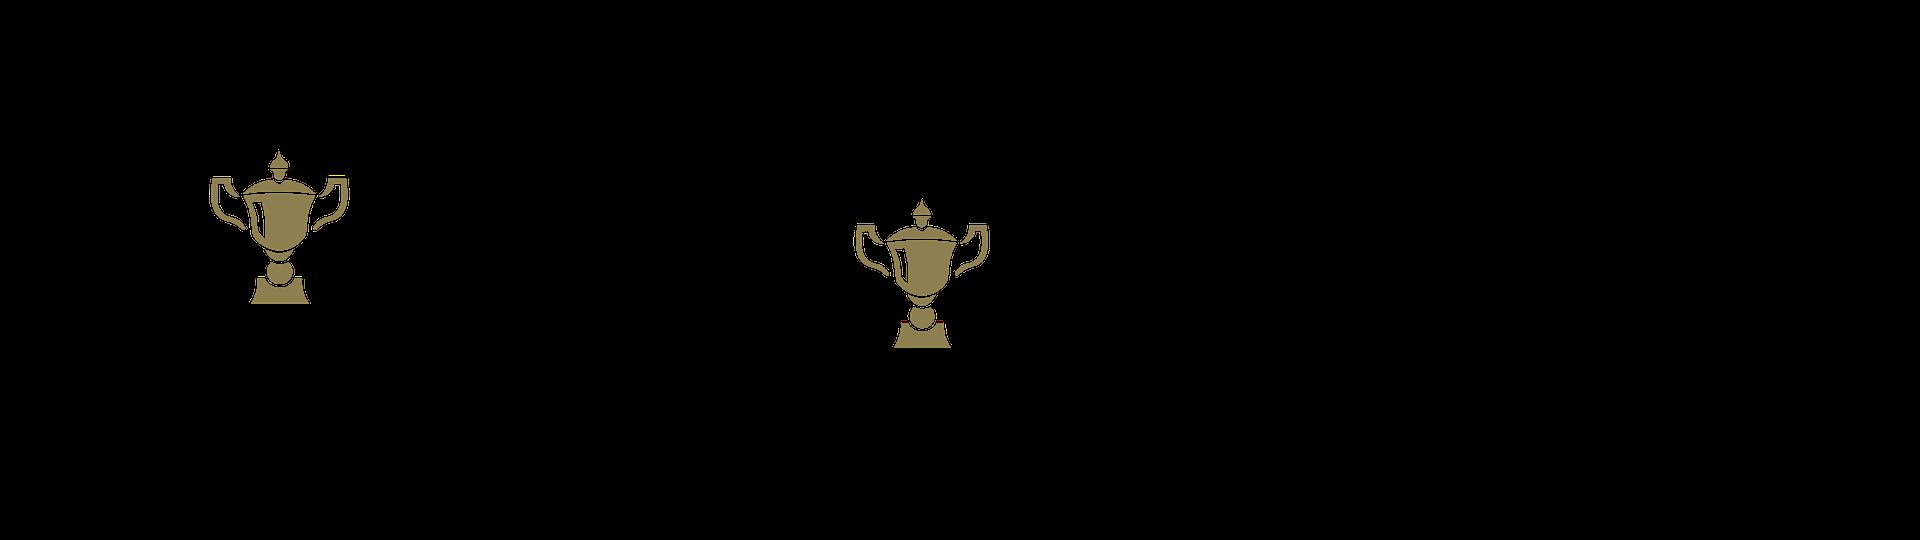 Champion Trophies and Awards regular logo and landscape logo